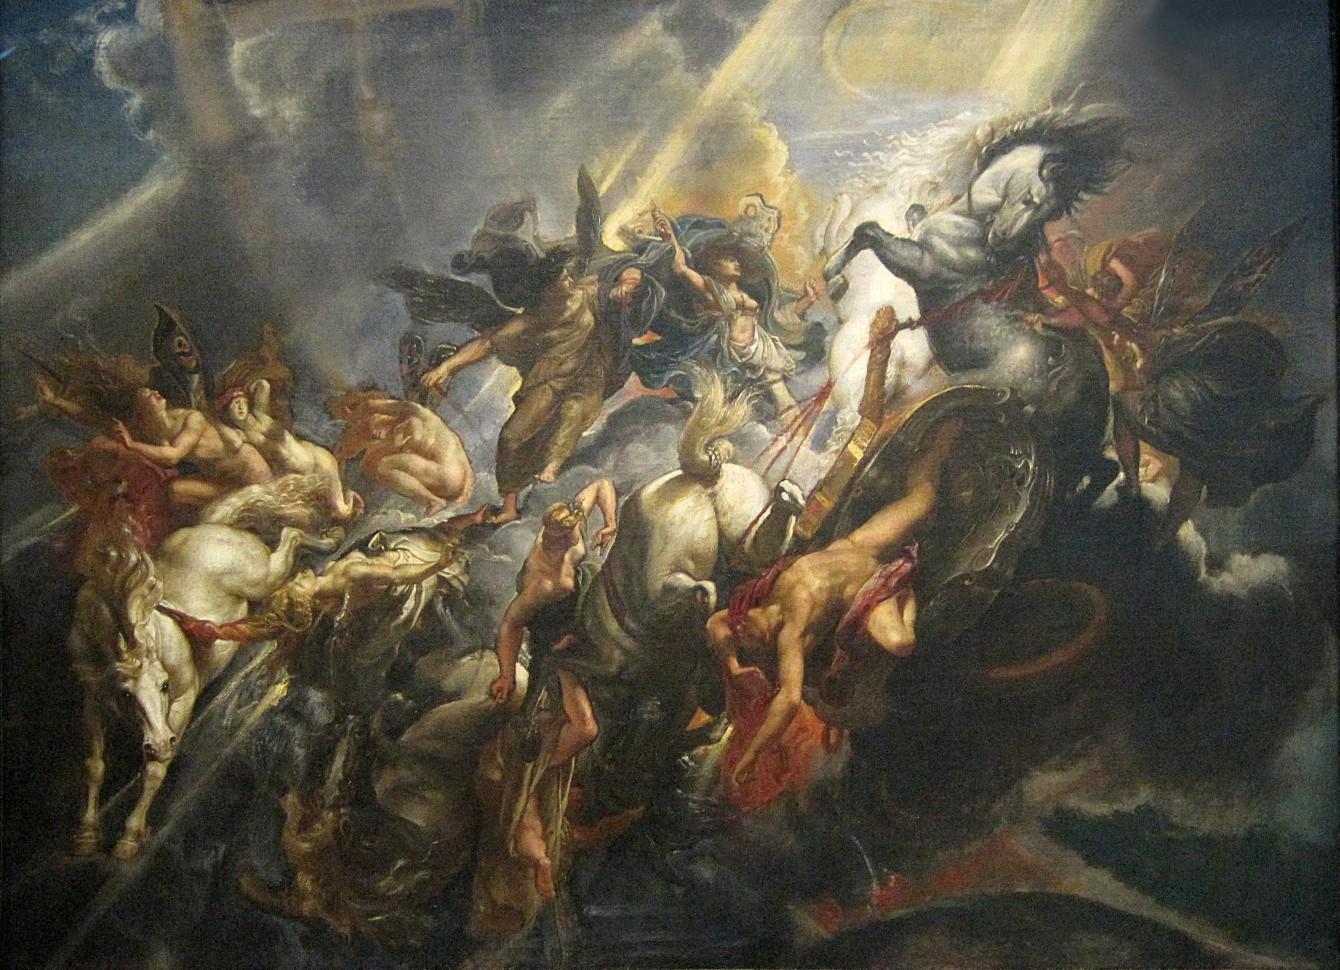 https://cdn.discordapp.com/attachments/500510296138579992/500539860822523904/La_Chute_de_Phaeton_-_Pierre_Paul_Rubens_-_National_Gallery_of_Art_-_1b.jpg